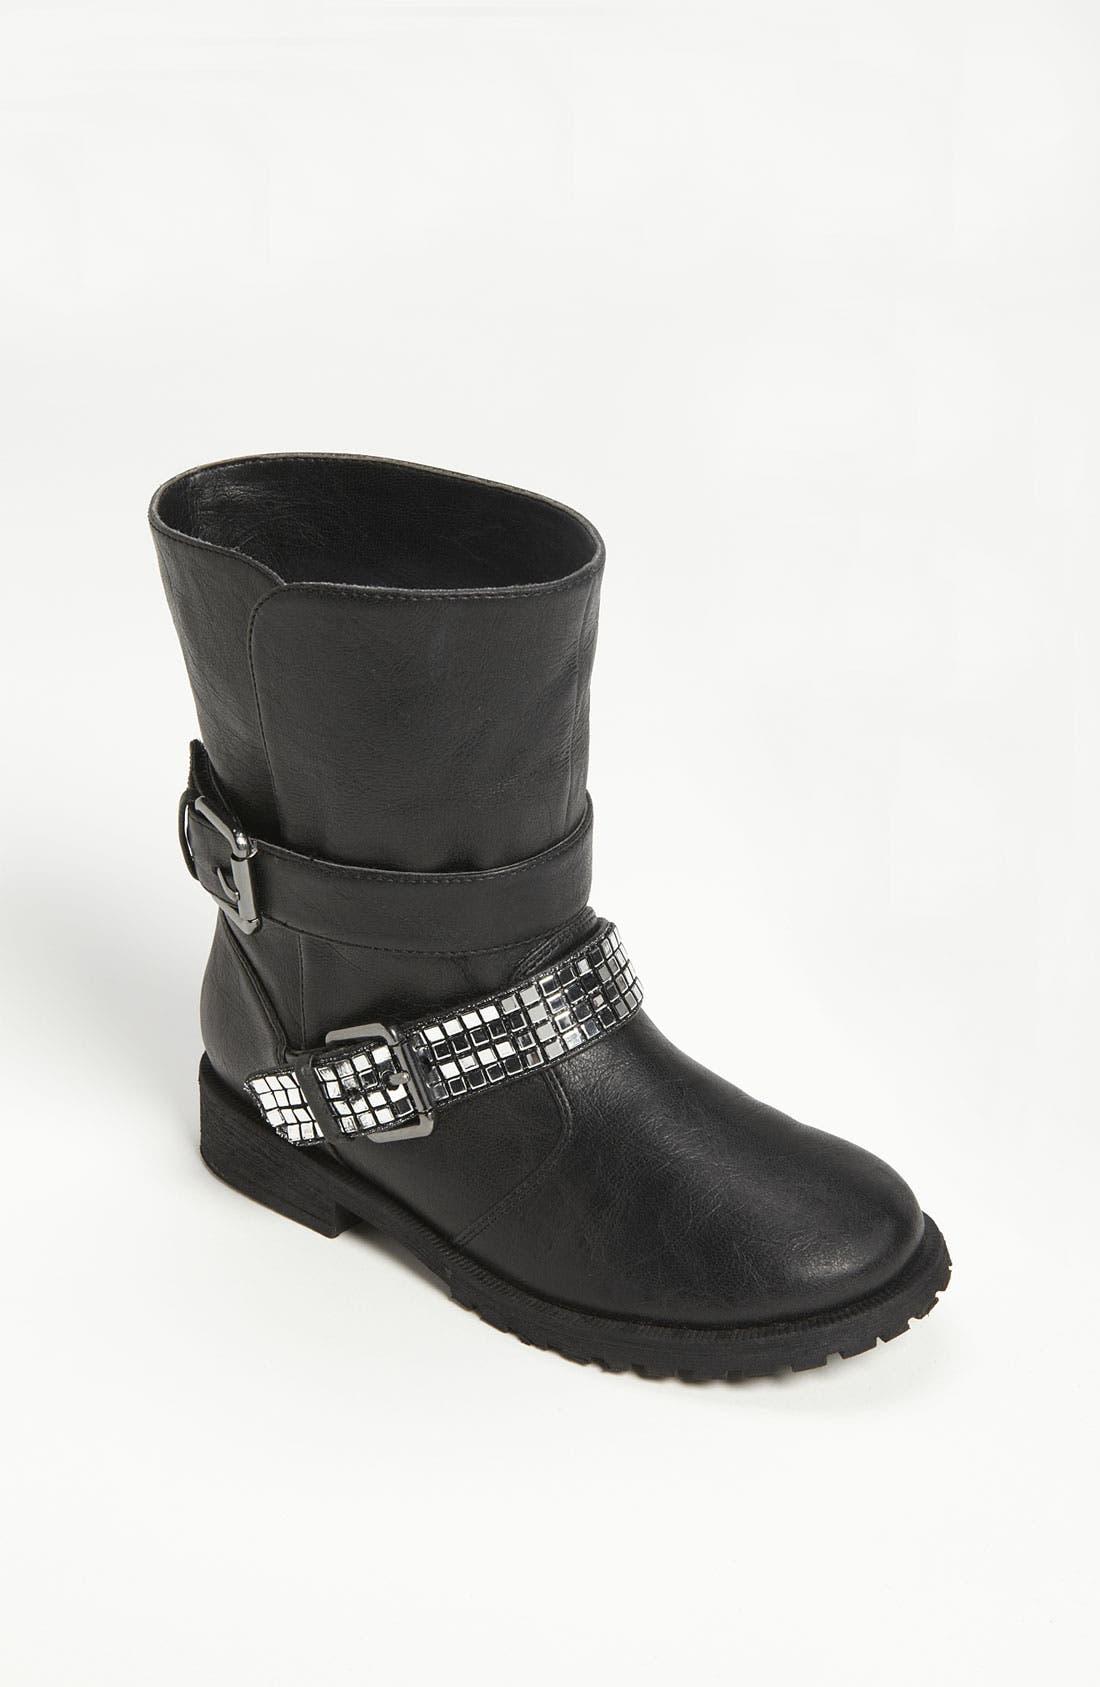 Main Image - Nordstrom 'Lindy' Boot (Toddler, Little Kid & Big Kid)